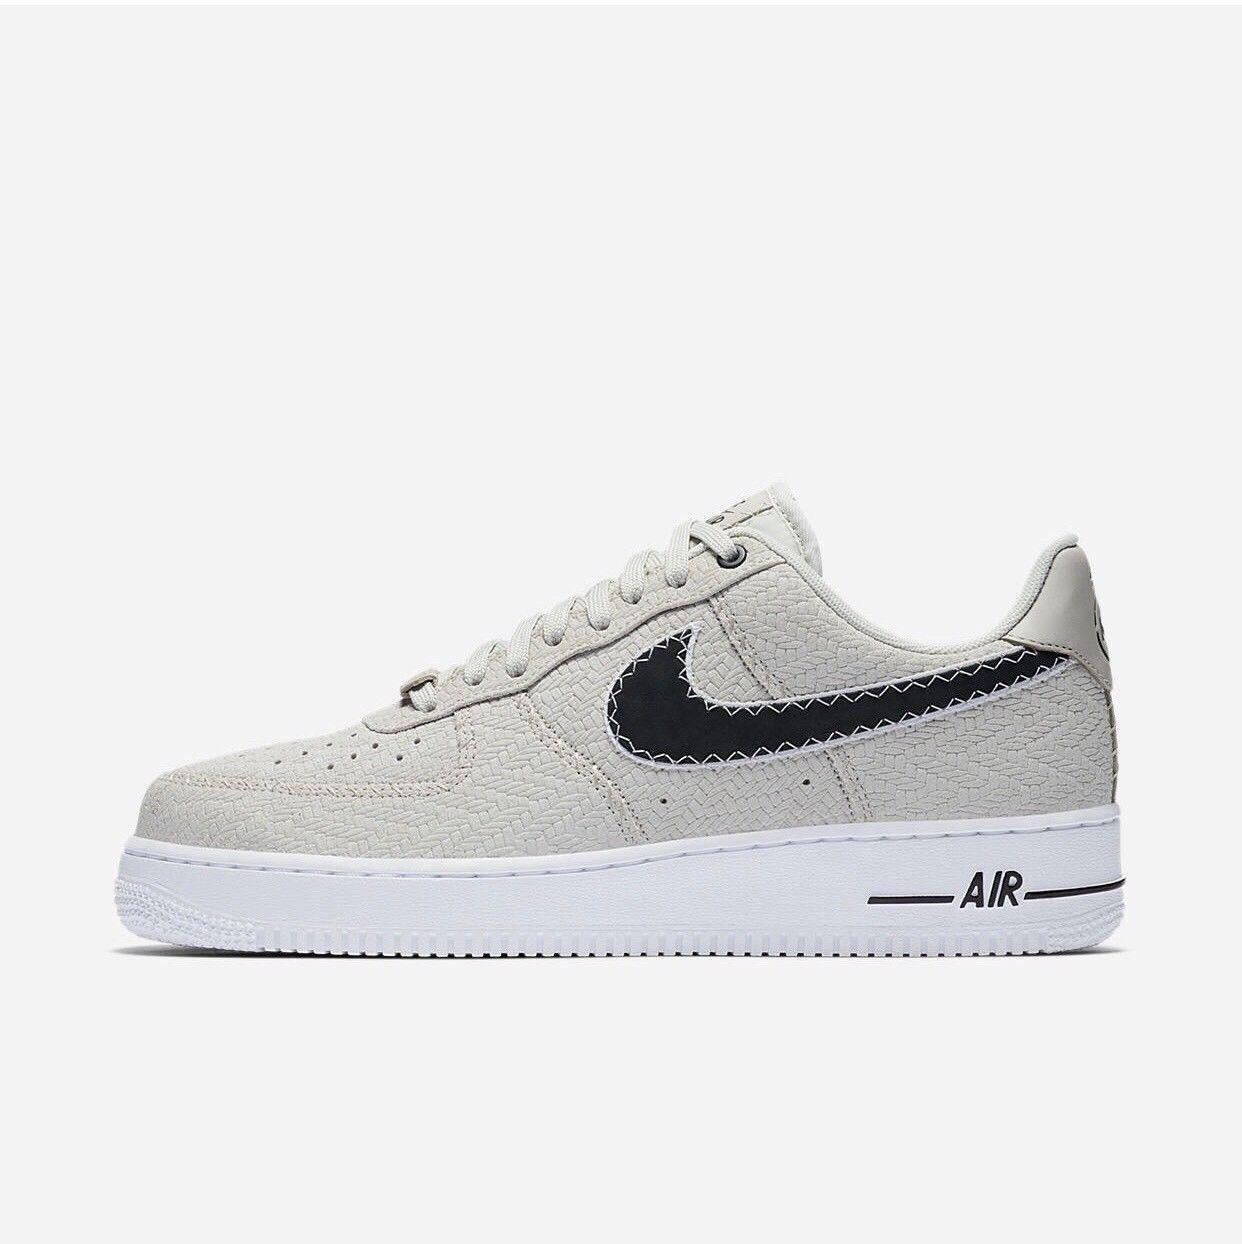 Nike Air Force 1 '07 N7 Light Bone Black White AO2369 001 Size 14 NO BOX TOP